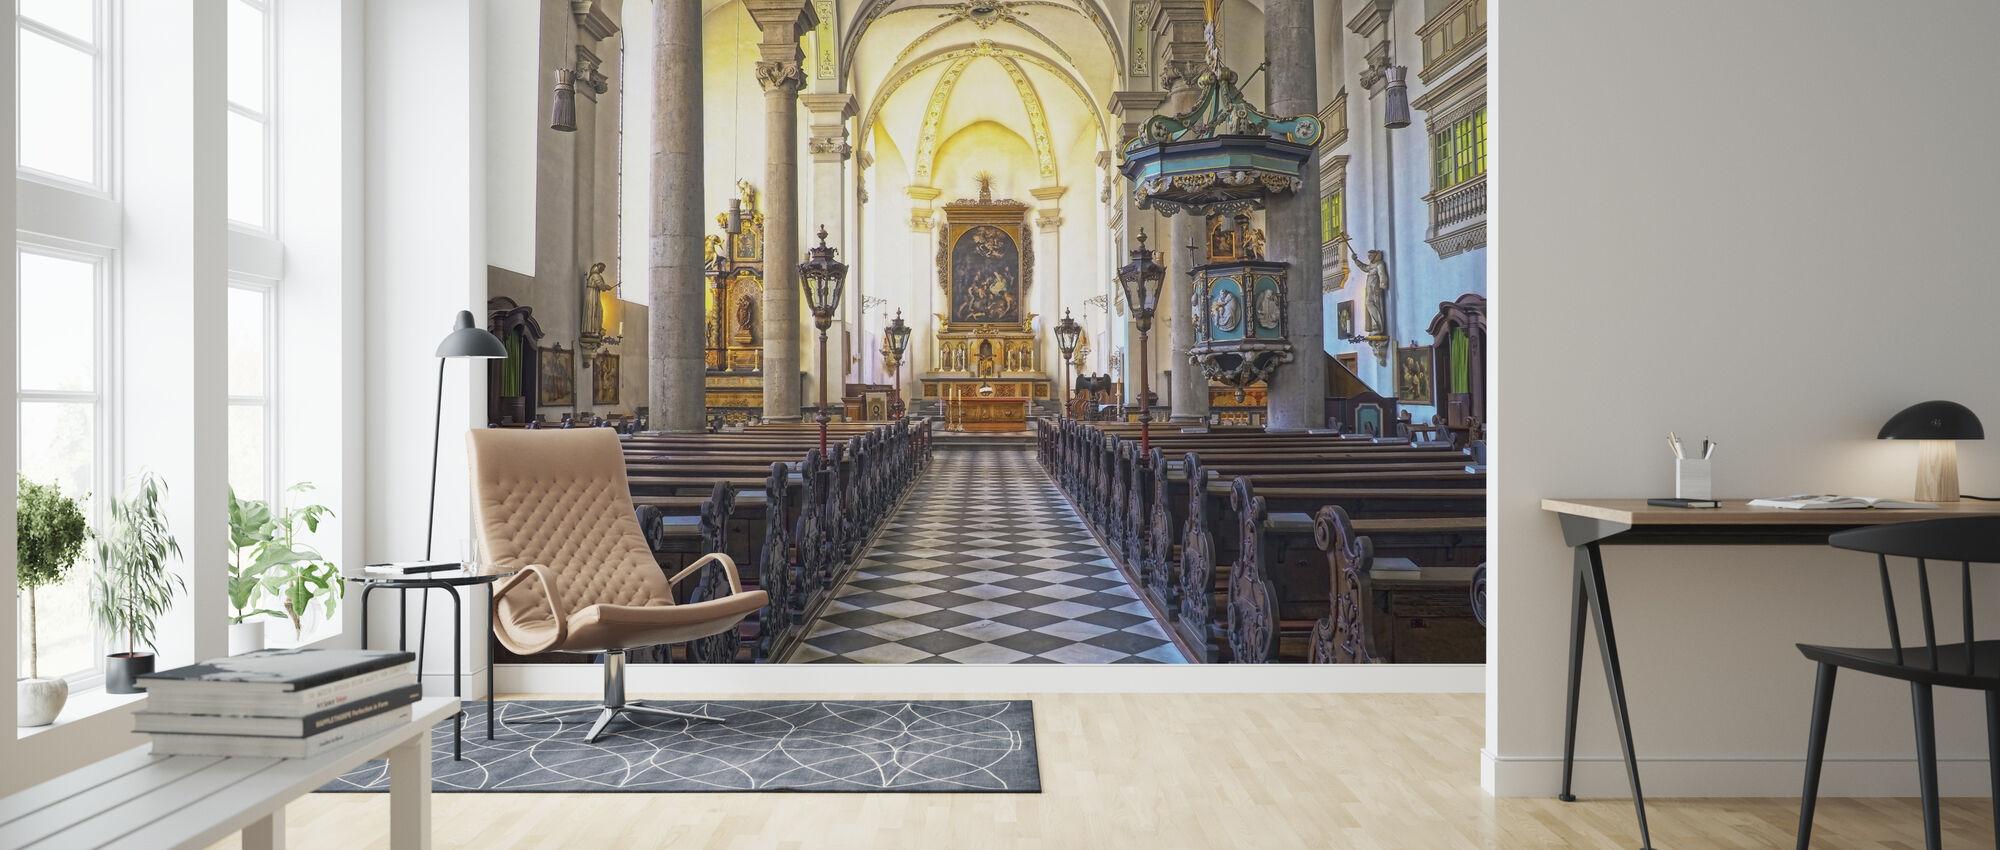 Kerkkerkbanken - Behang - Woonkamer